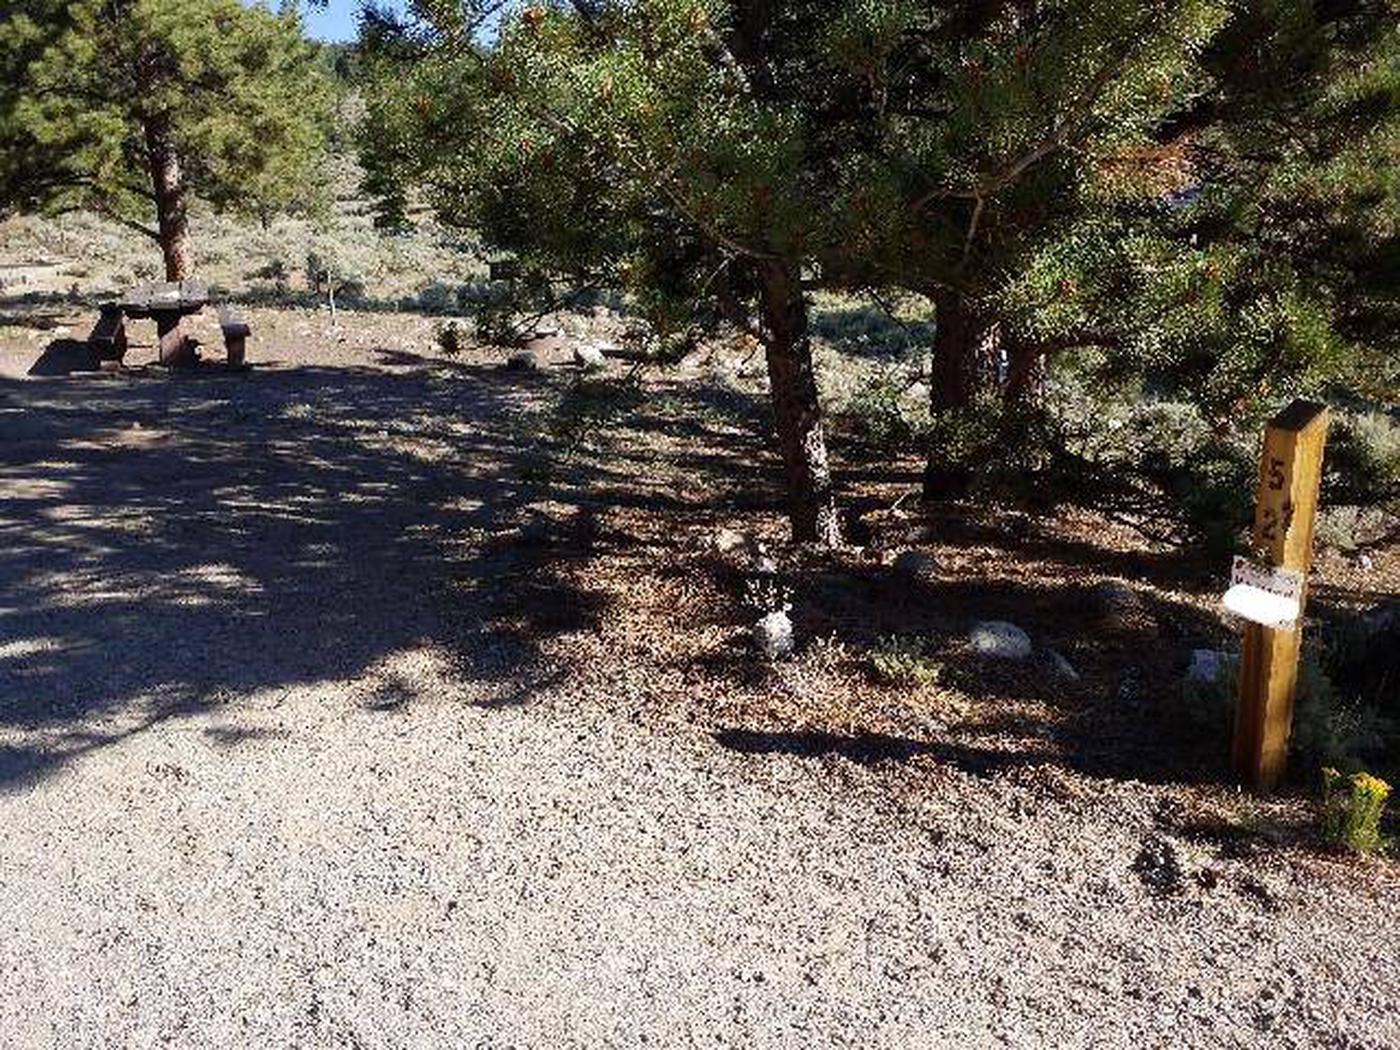 White Star Campground, site 52 marker White Star Campground, site 52 marker